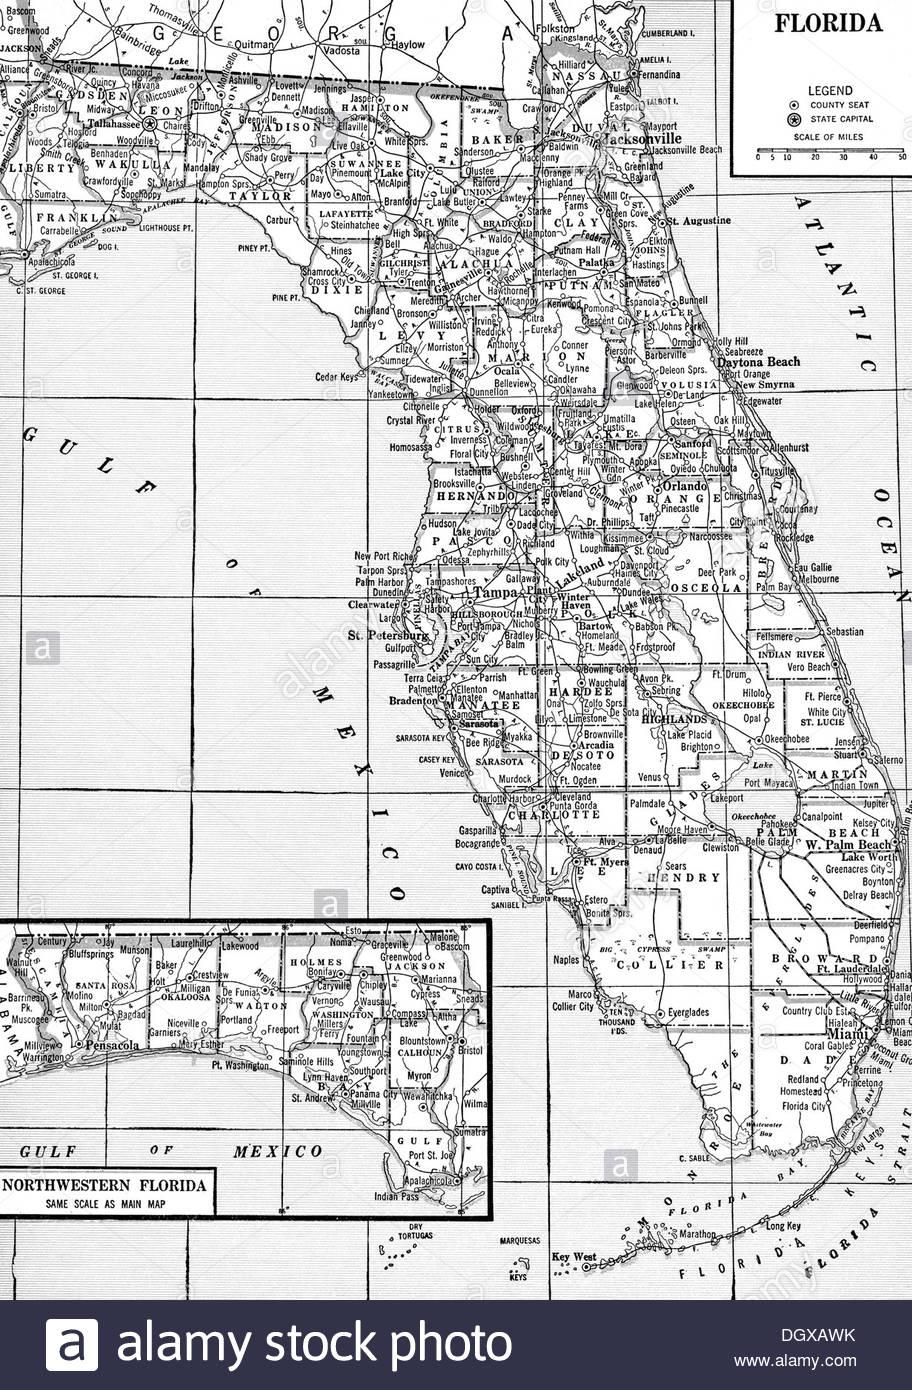 Florida Map Black And White Stock Photos & Images - Alamy - Florida Map Black And White